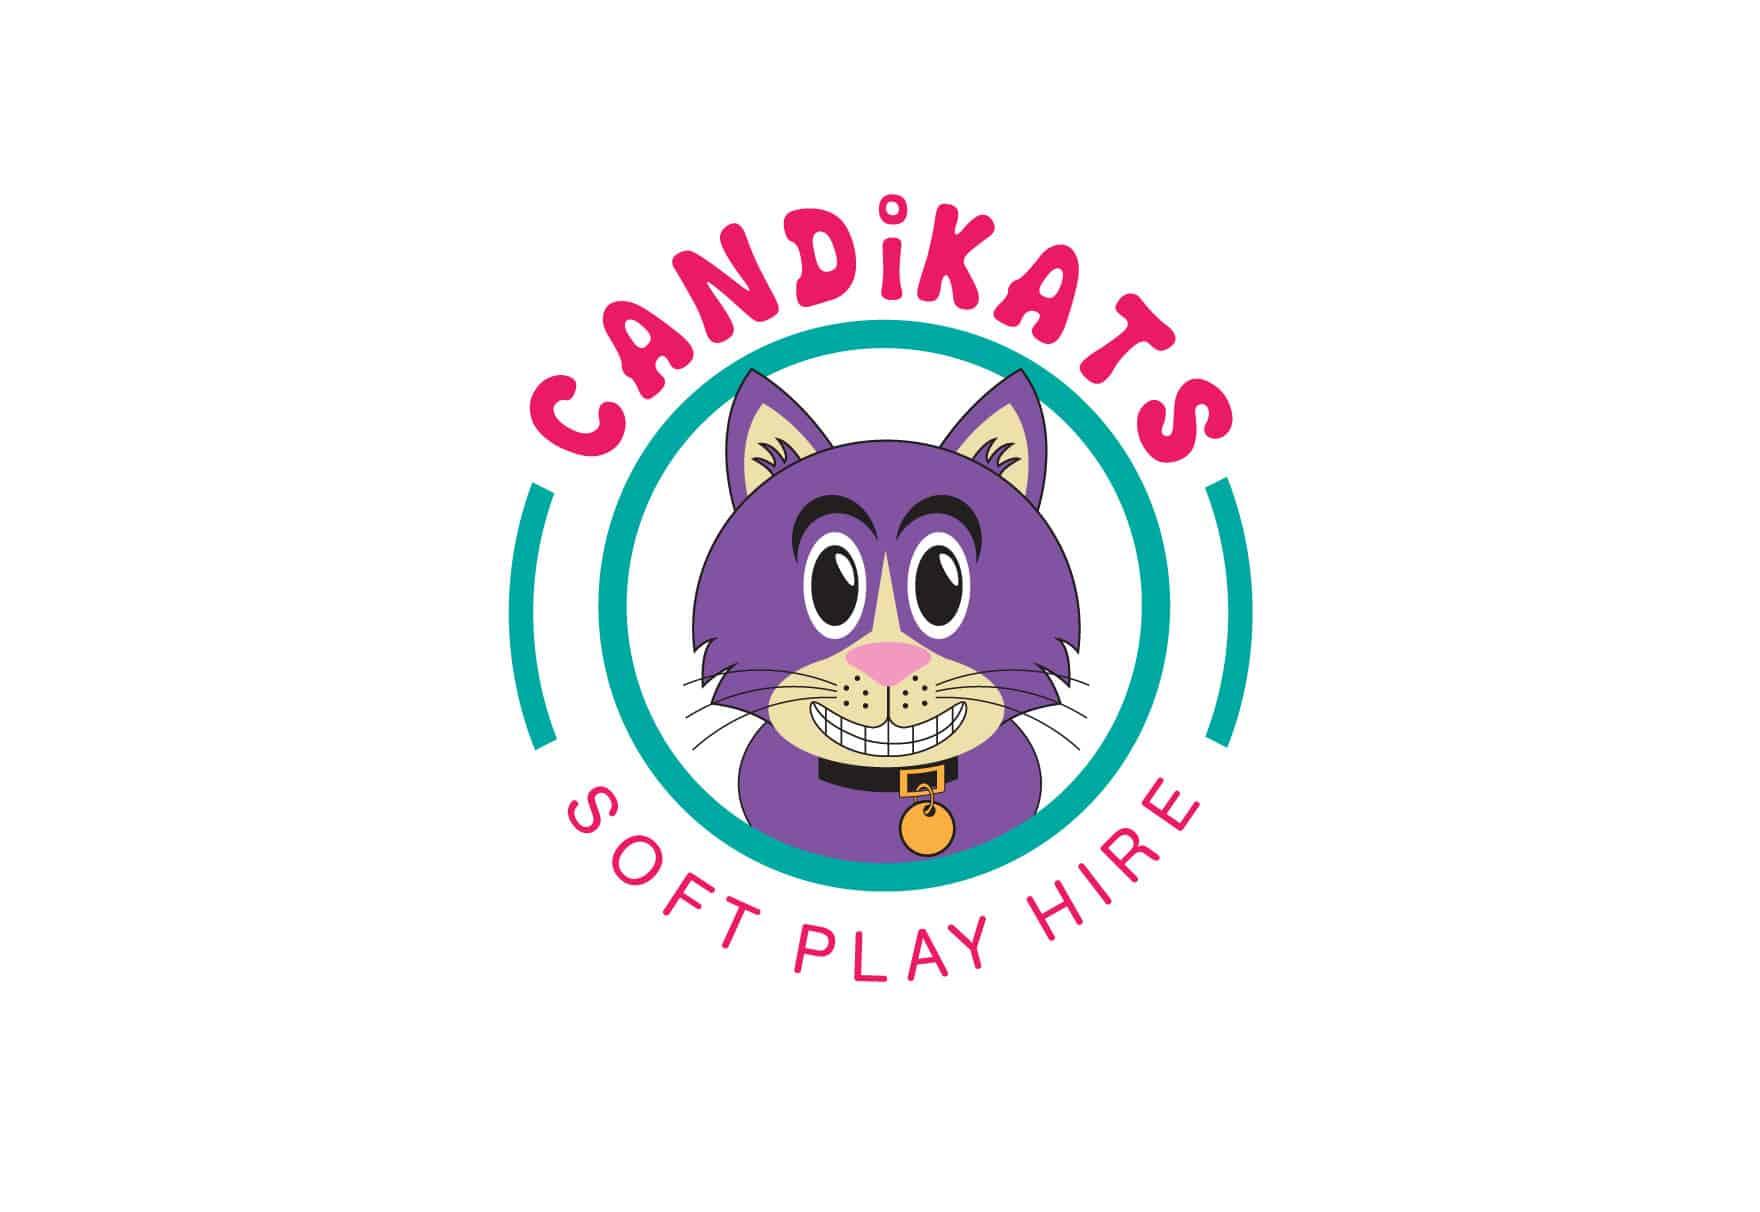 candikats-logo-design